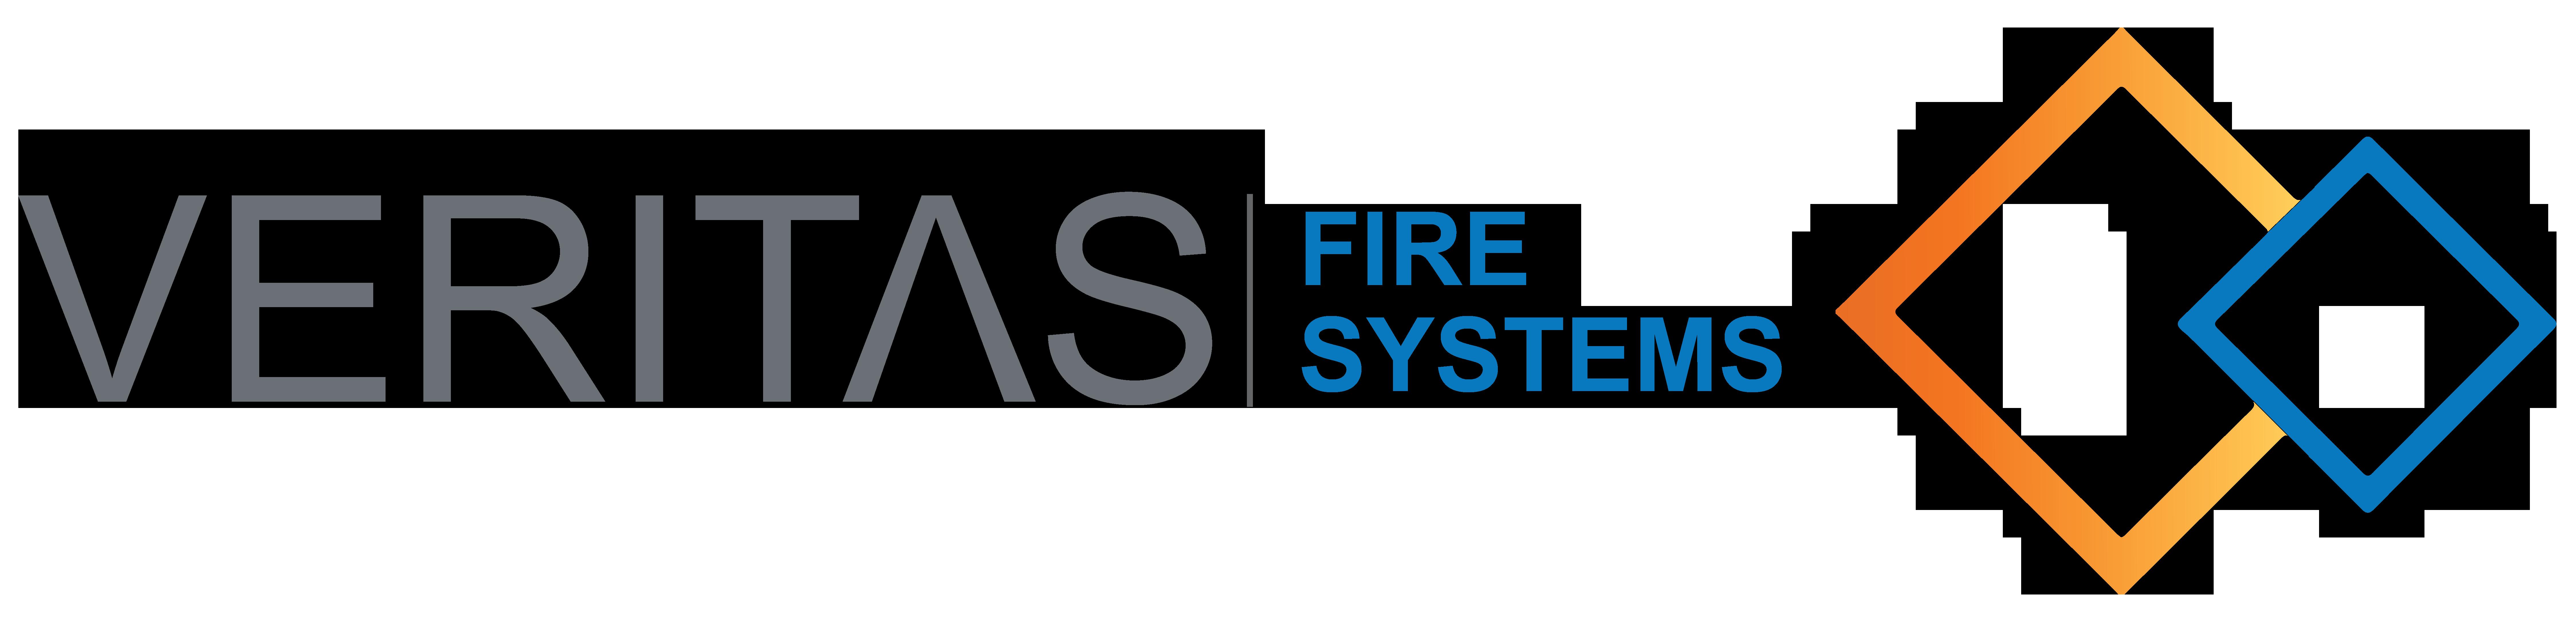 Veritas Fire Systems